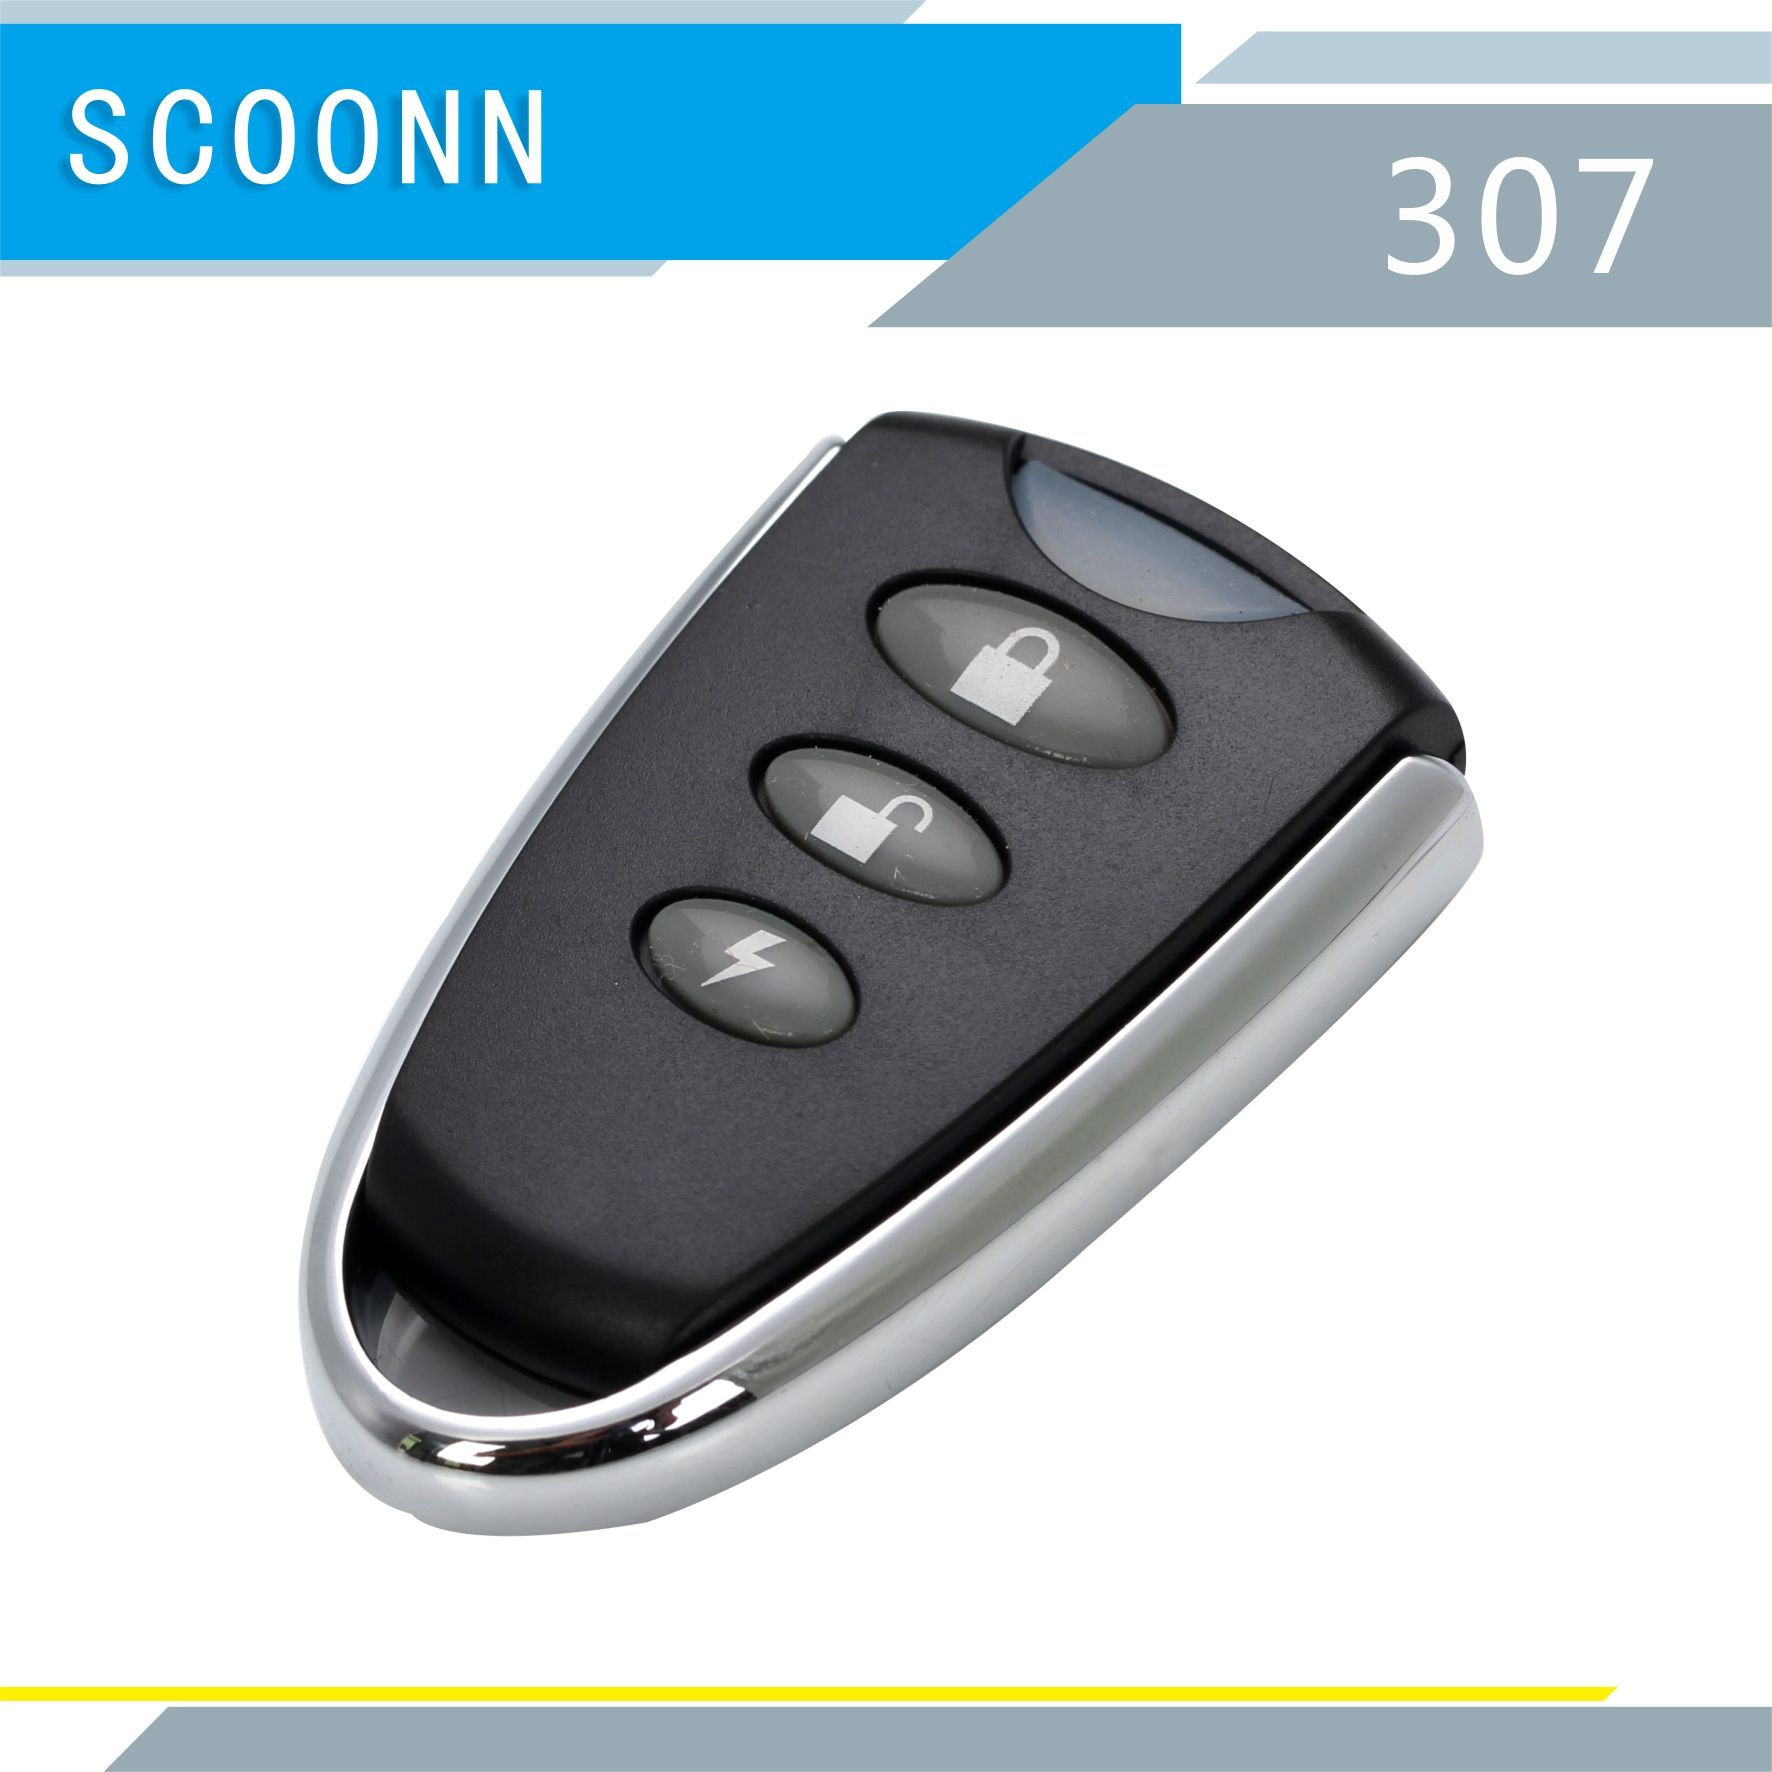 Free Shipping Remote Control Duplicator Code Grabber 433mhz Garage Door Opener Gate Universal 433 Mhz Remote Control Ev1527 Key Fob Clone Di 2020